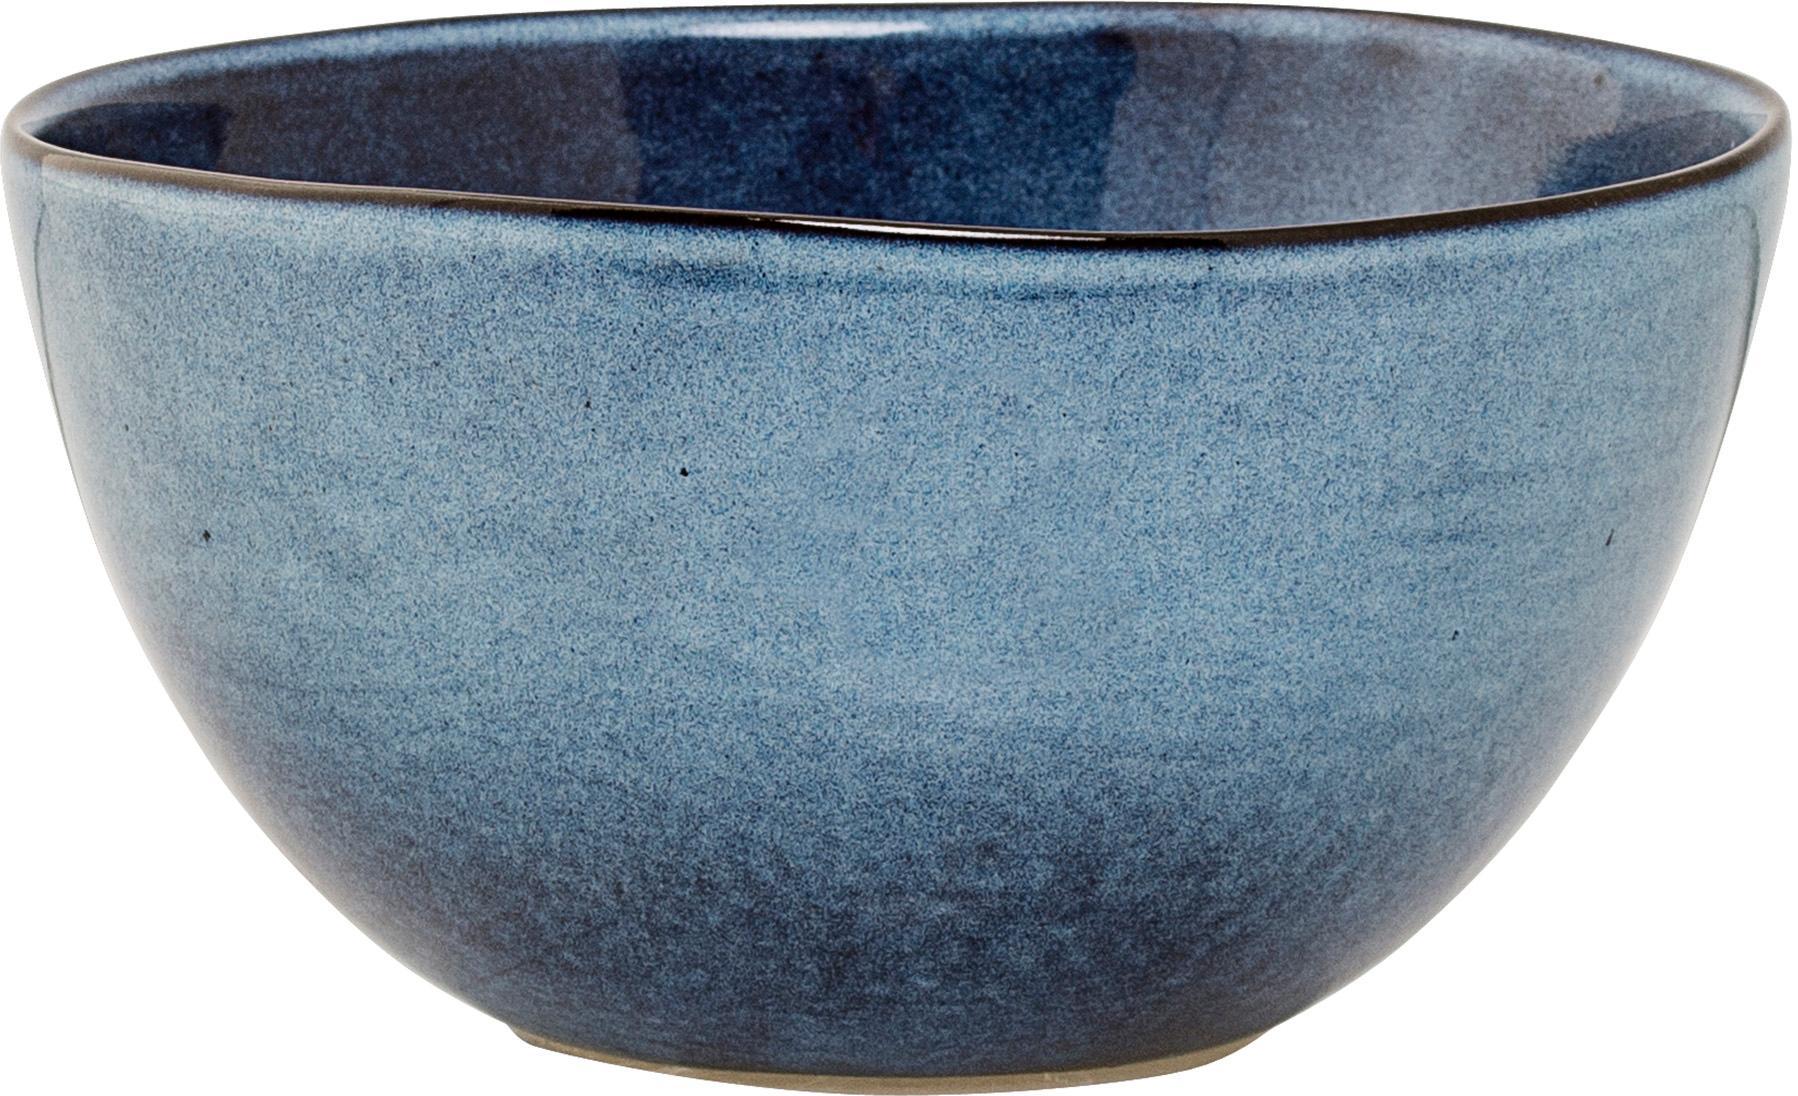 Ciotola fatta a mano blu Sandrine 6 pz, Terracotta, Tonalità blu, Ø 15 x Alt. 8 cm